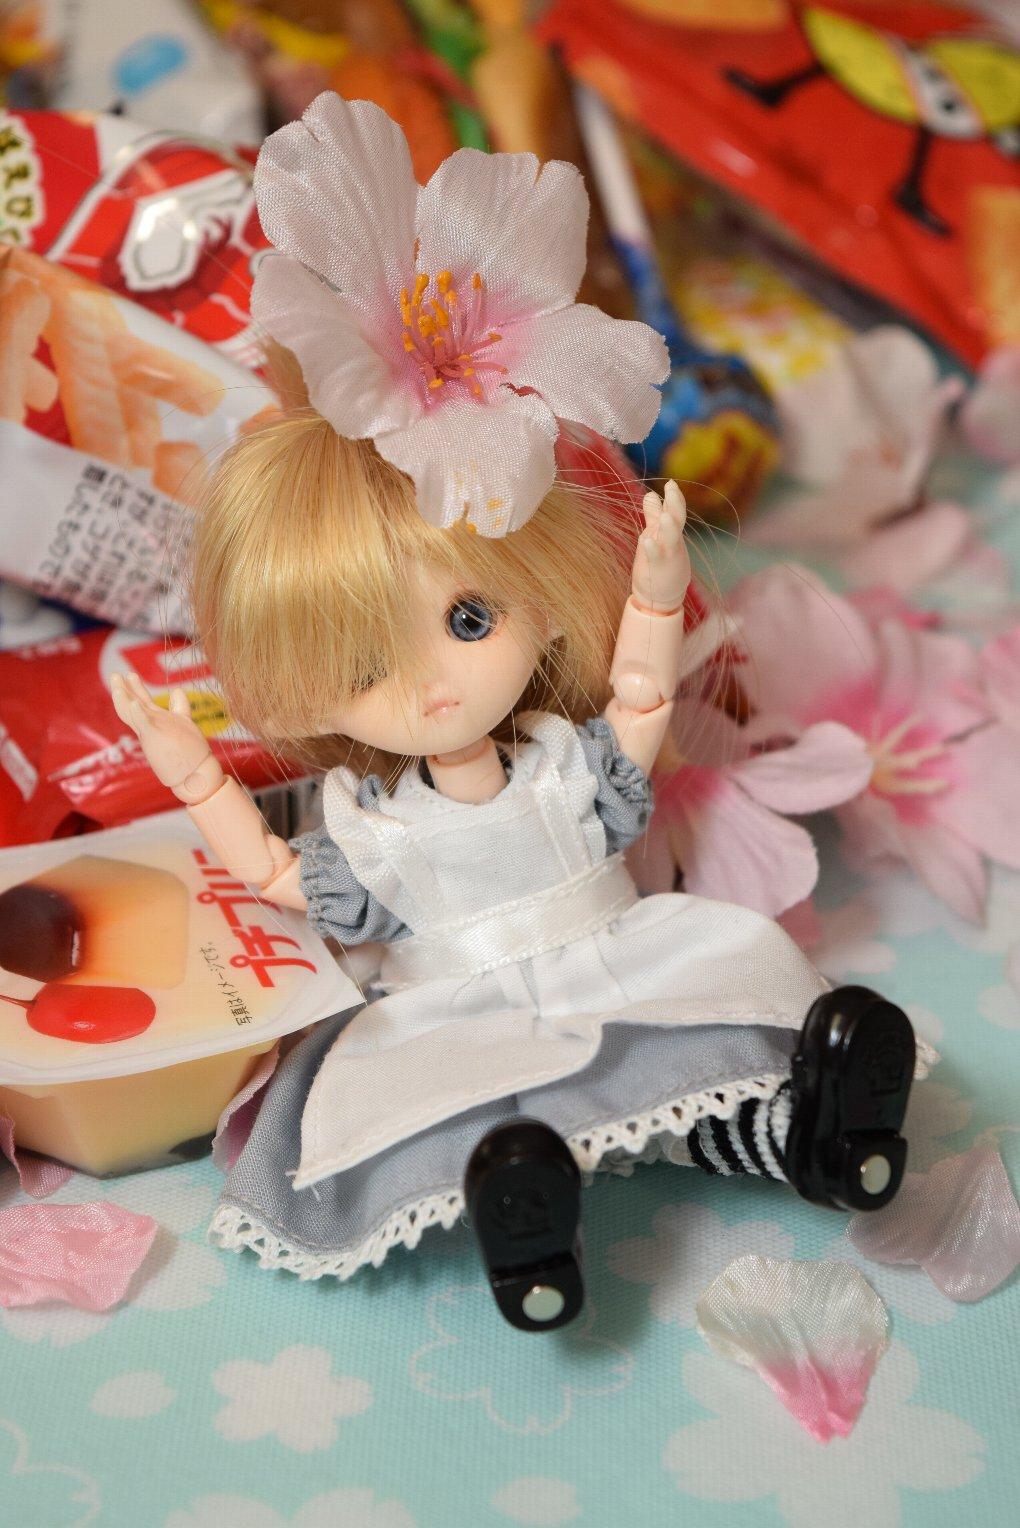 doll_4277.jpg